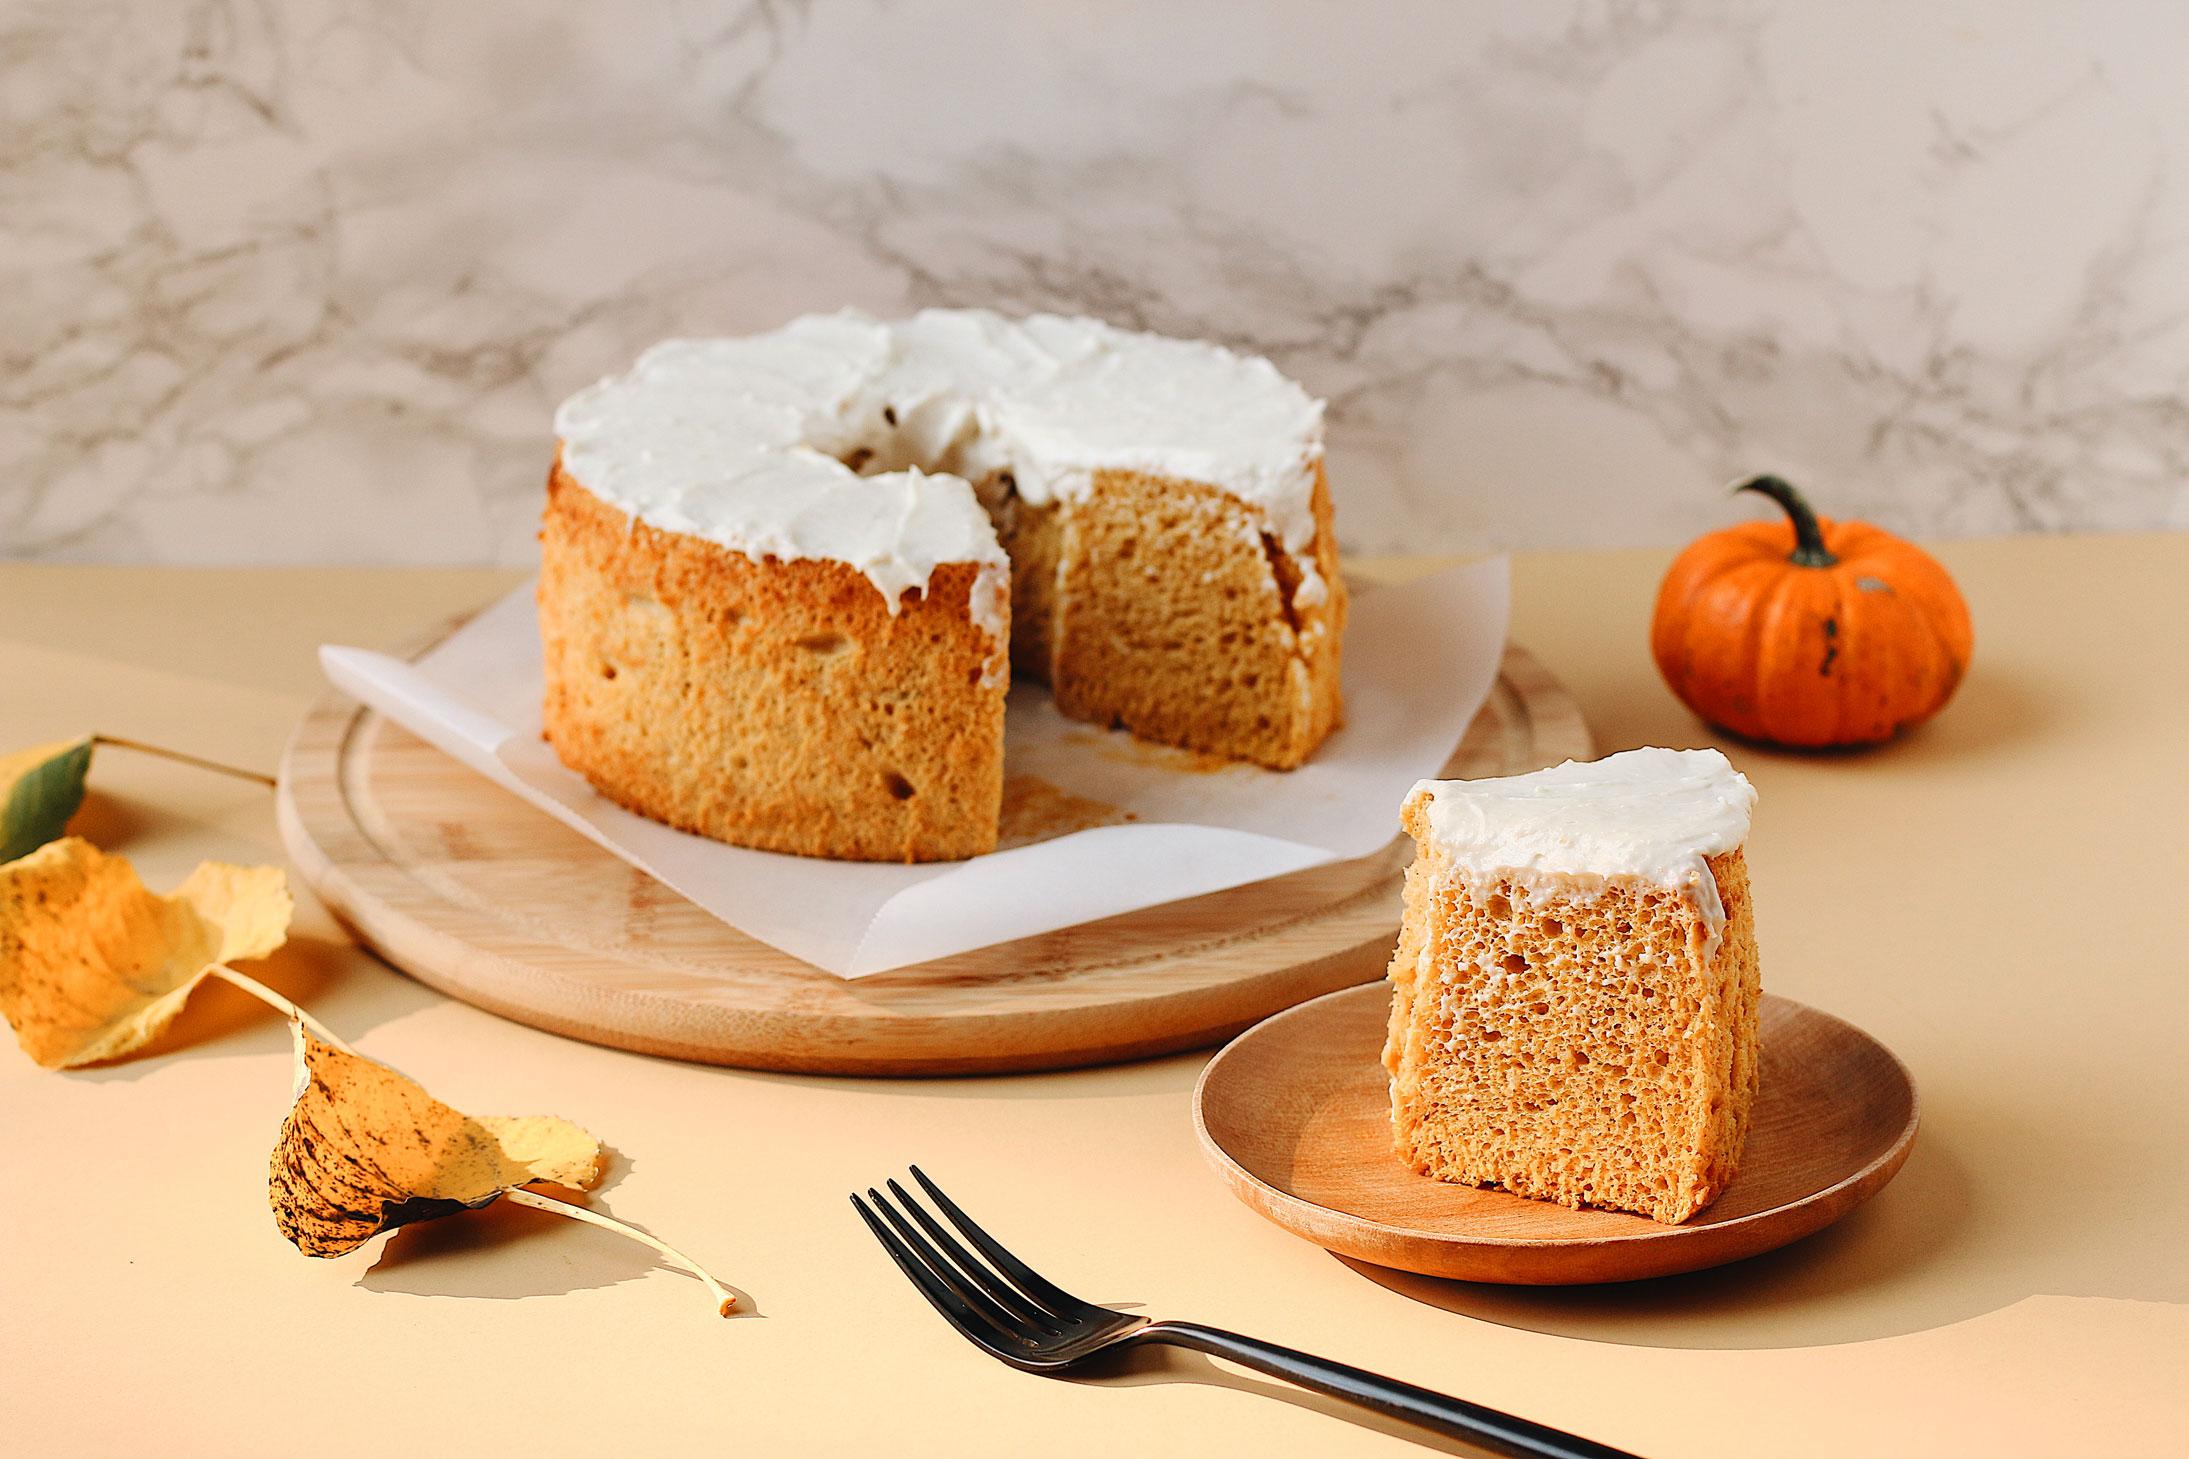 herbakinglab-pumpkin-angel-food-cake-cut